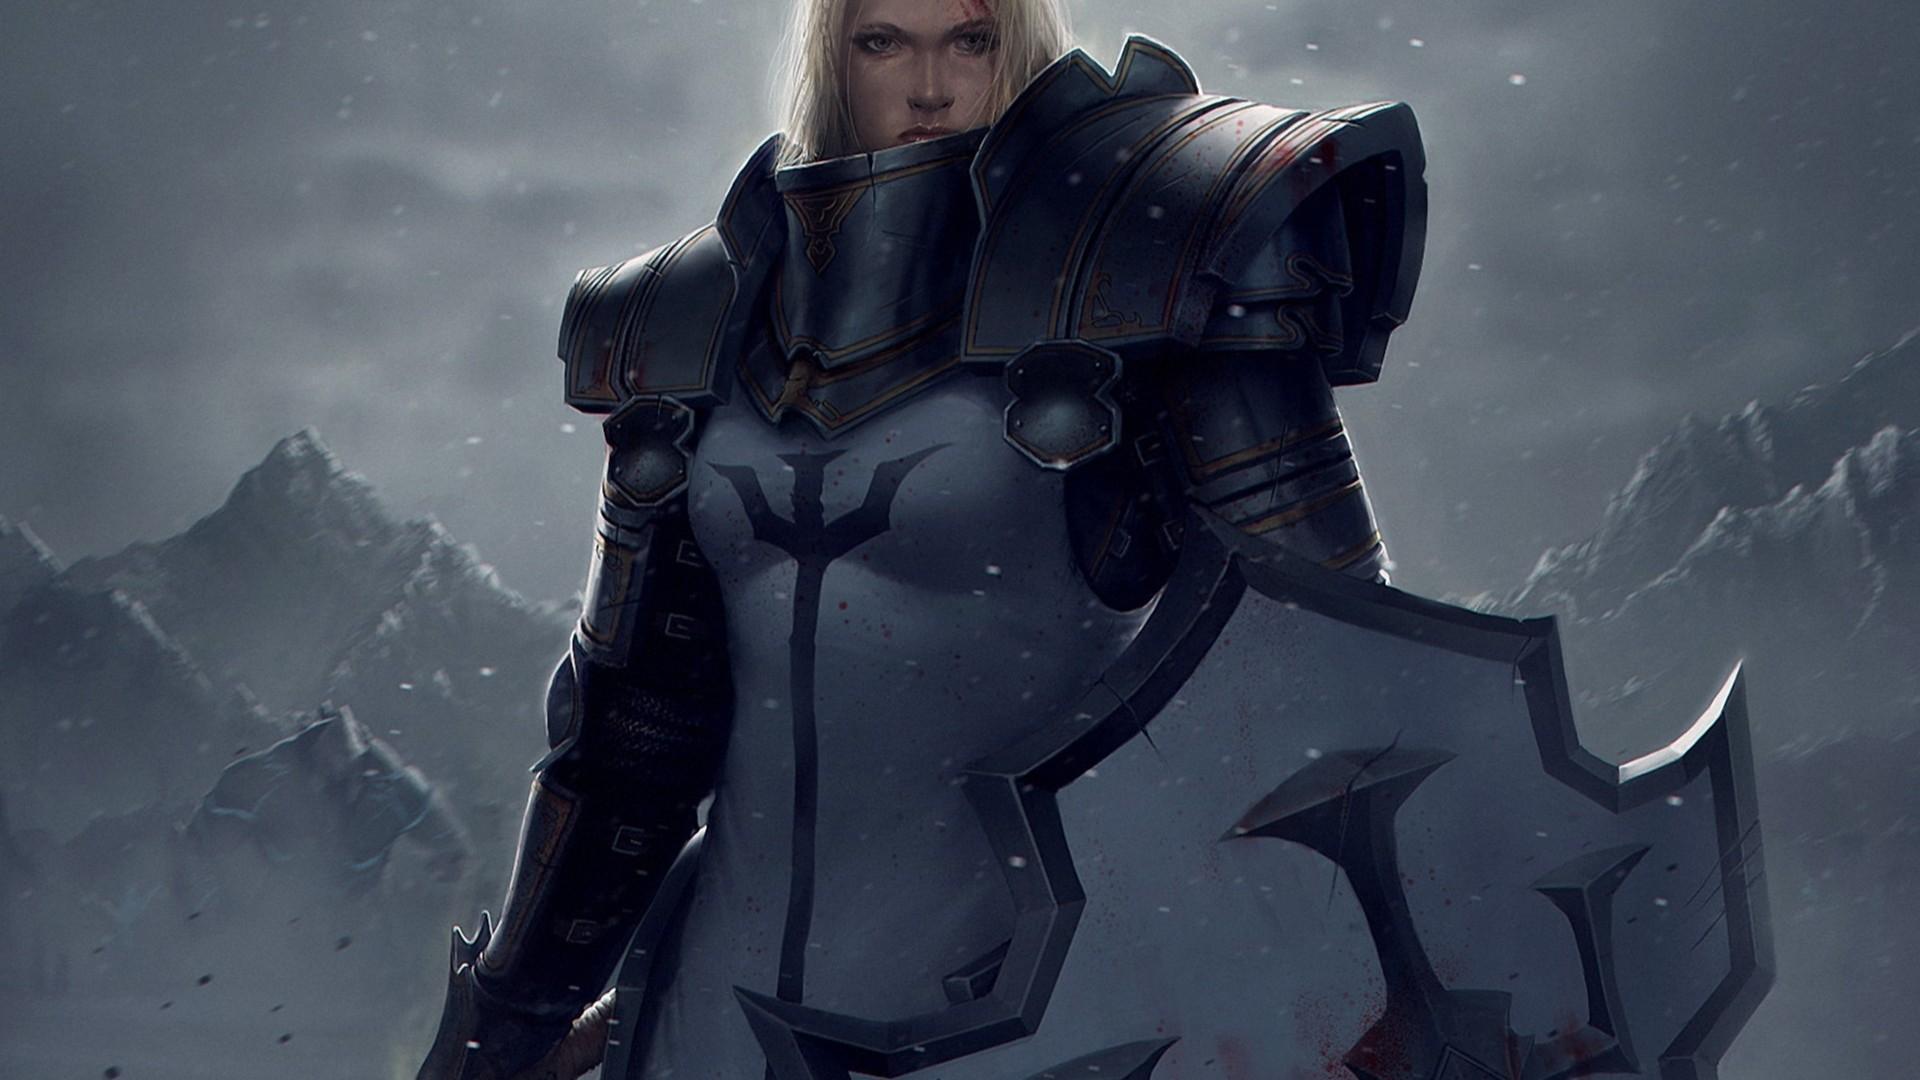 Diablo 3 female crusader porn erotic video